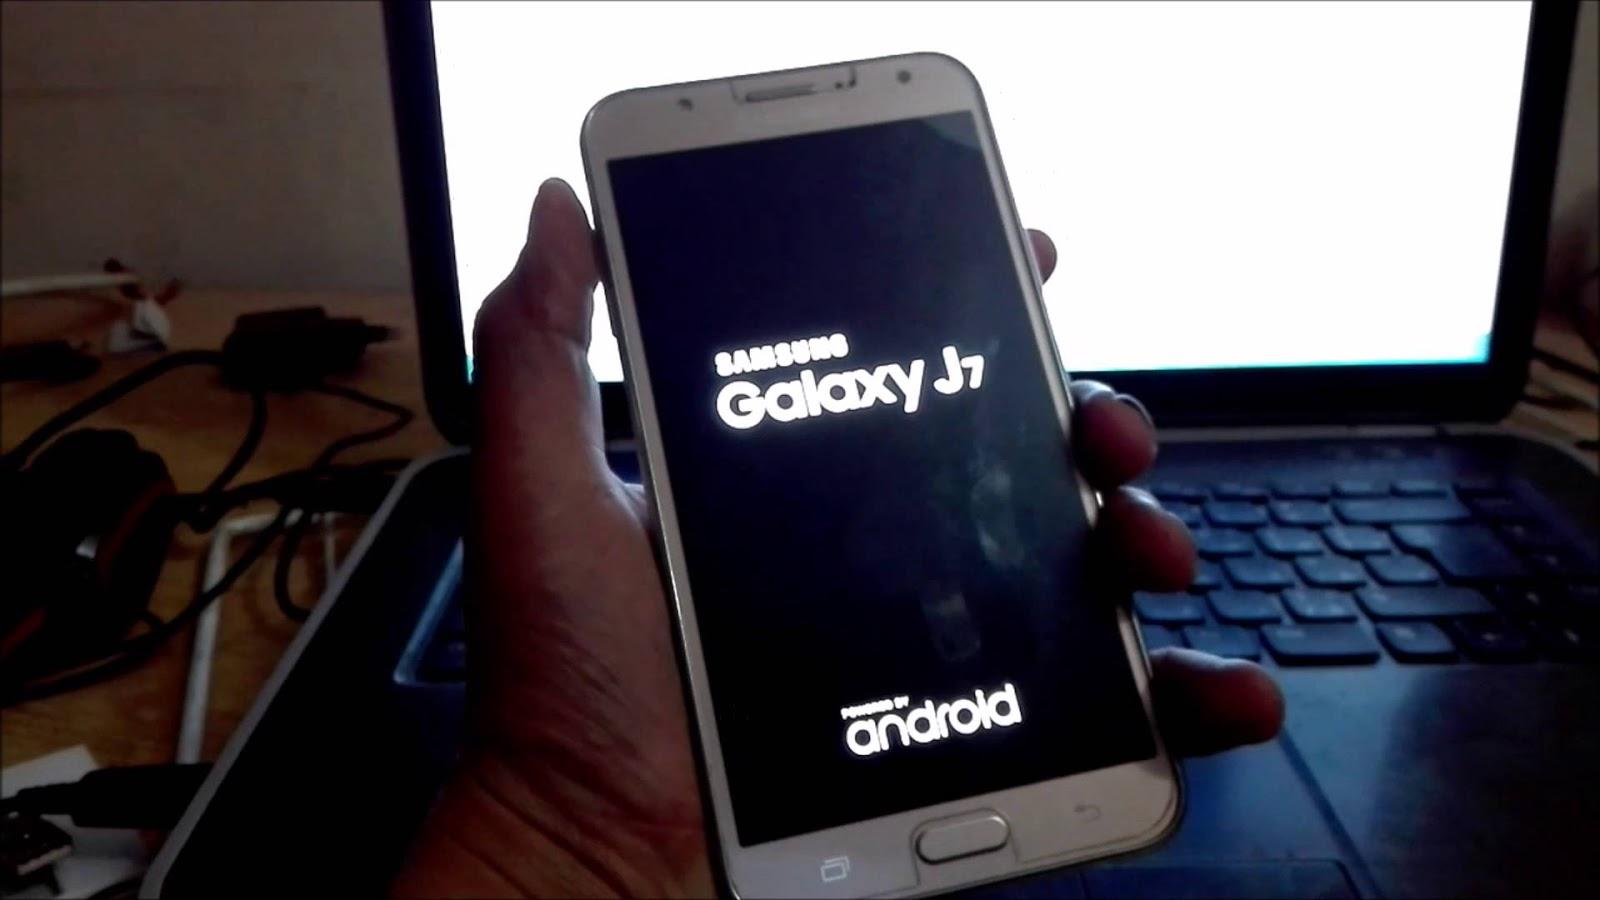 Samsung j700h firmware - Mt6582__samsung__sm J700h__galaxy_j7__5 0__j8270_5 0_v1 6 Mony Back Guarantee